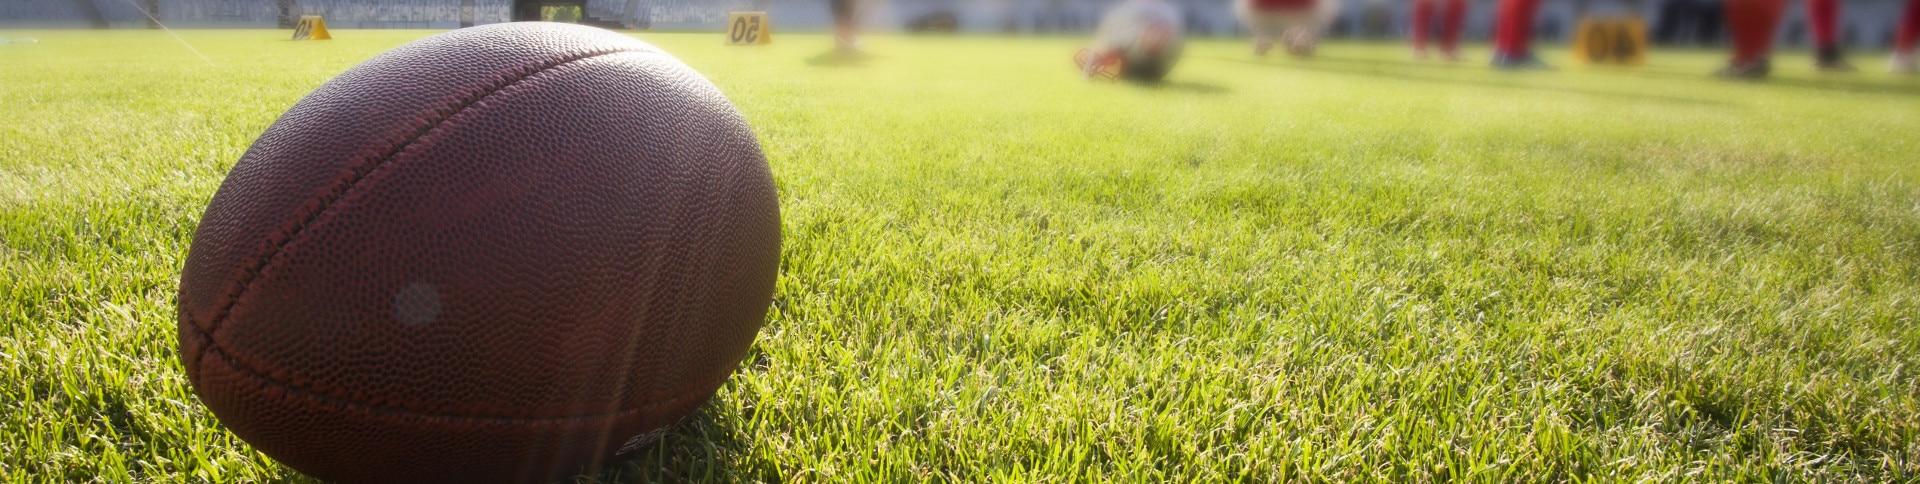 American Football Insurance img